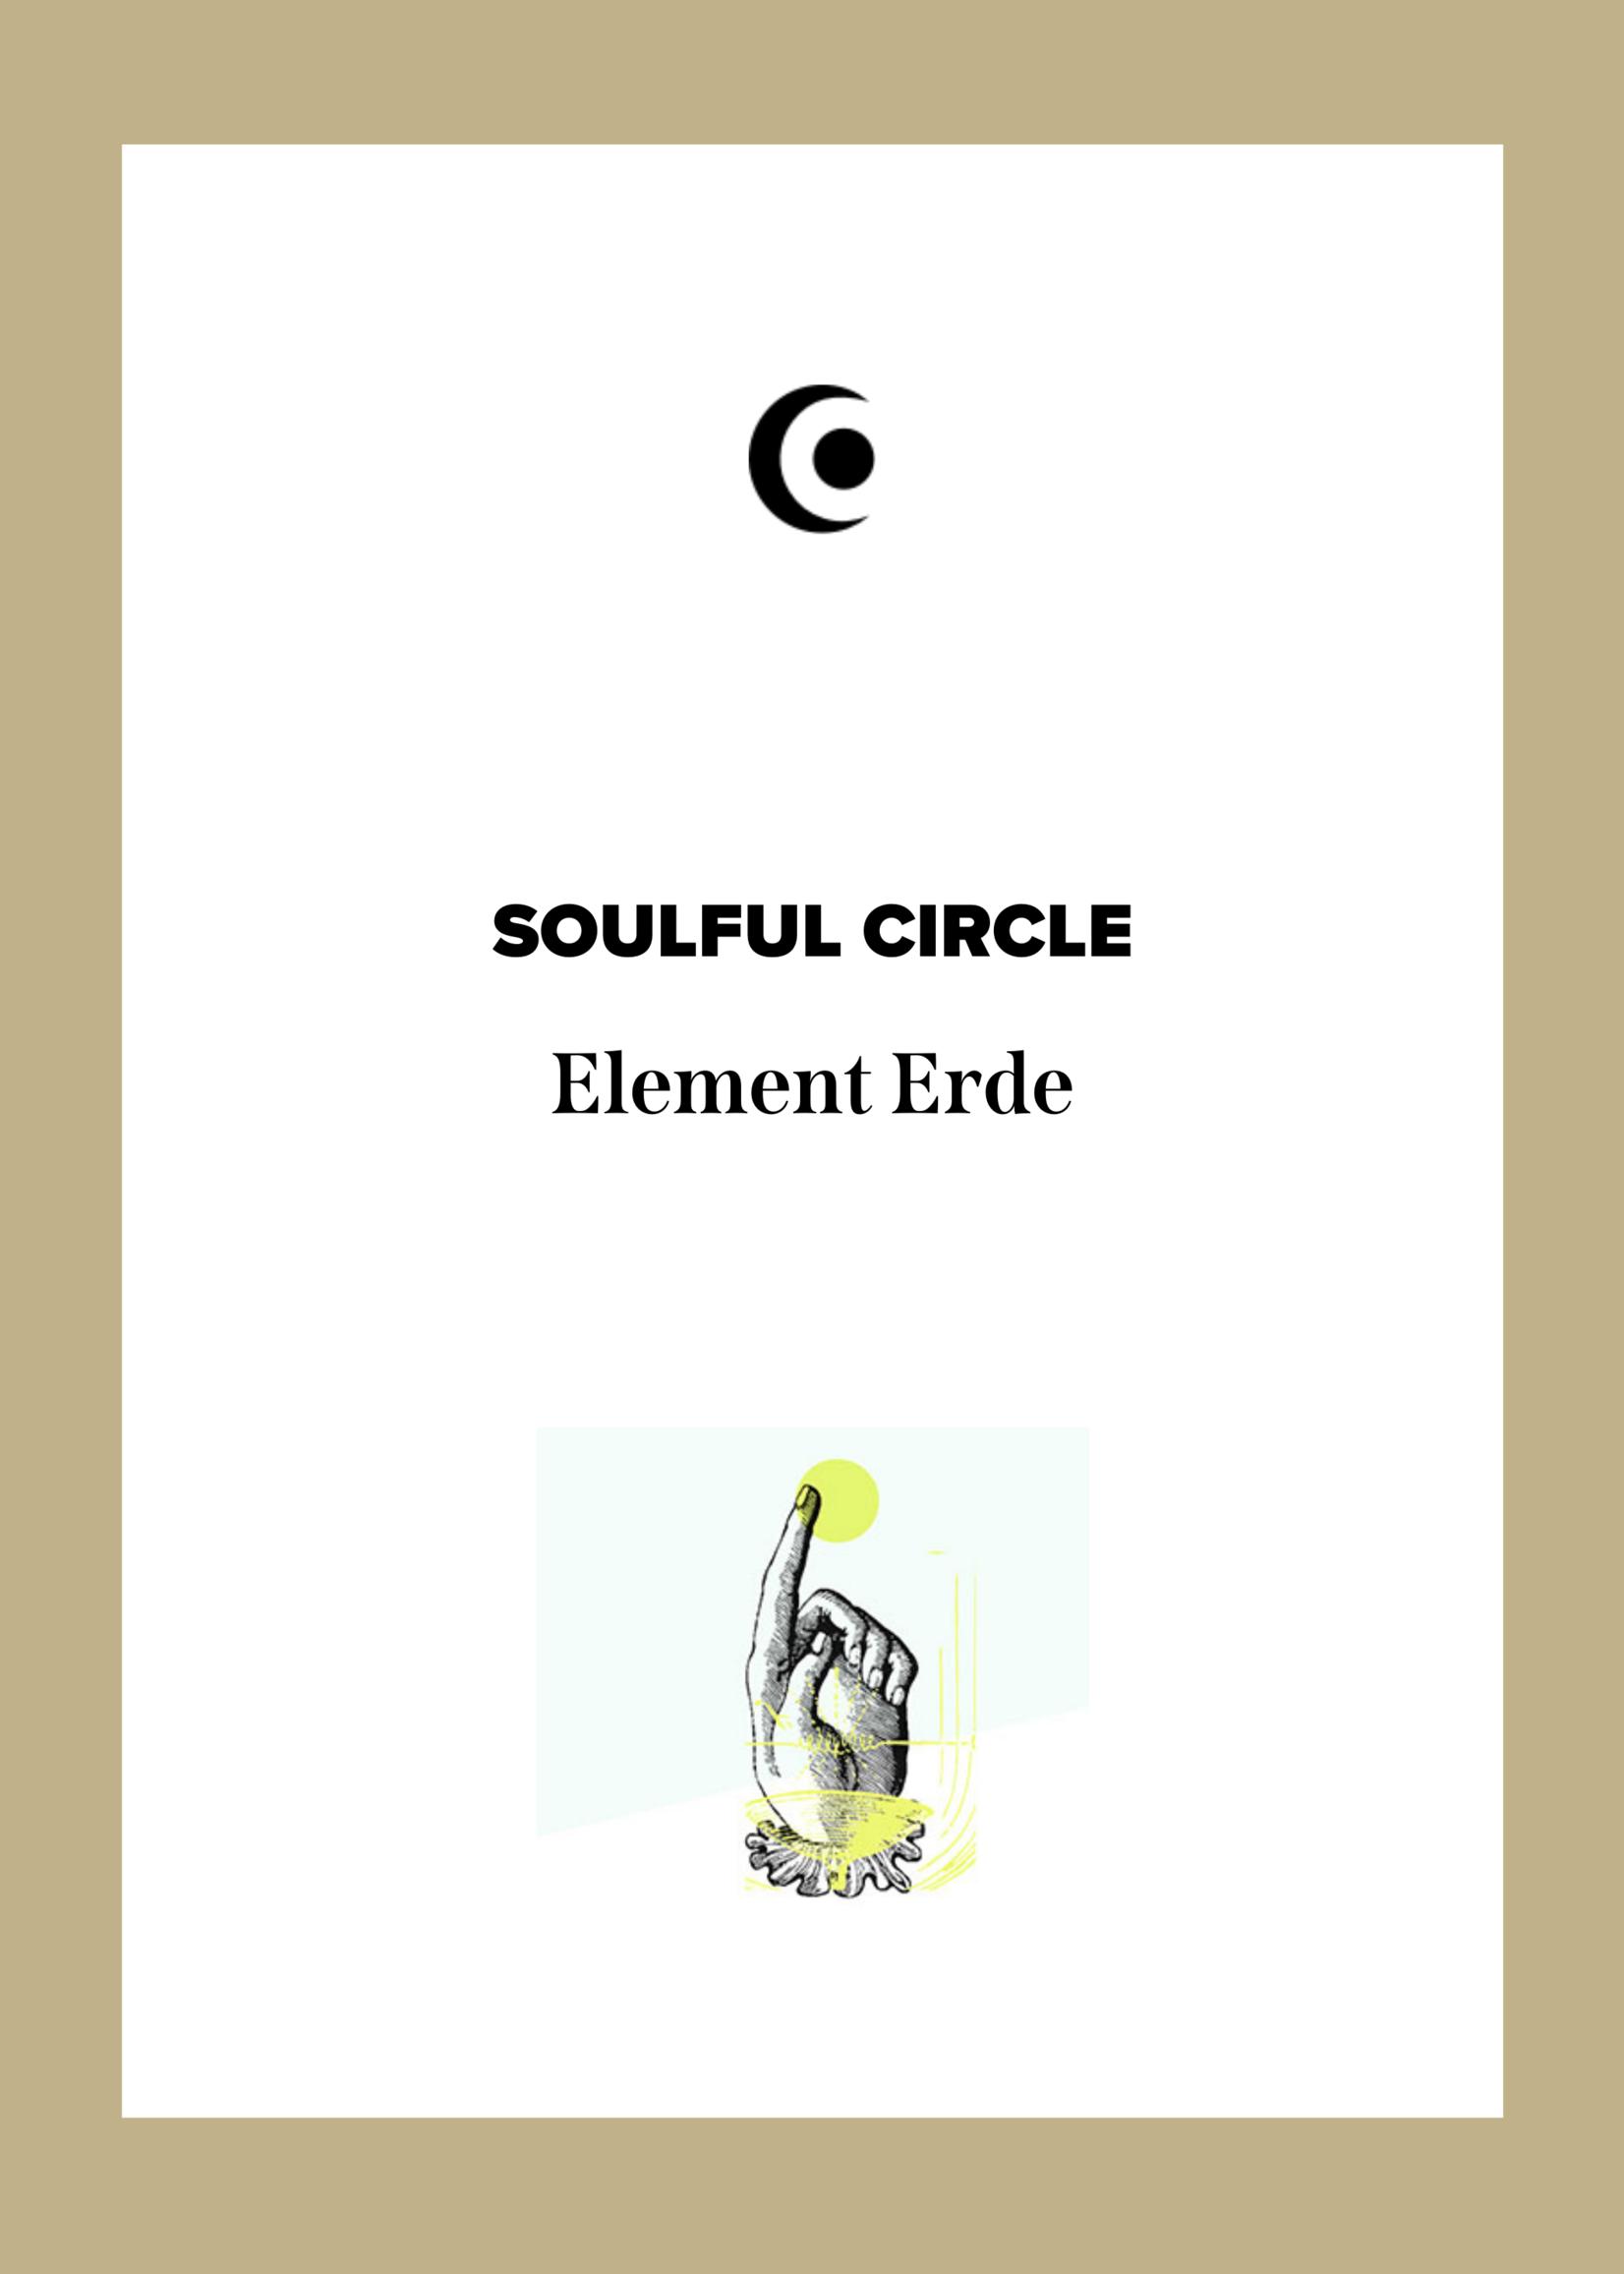 SOULFUL CIRCLE - Element ERDE